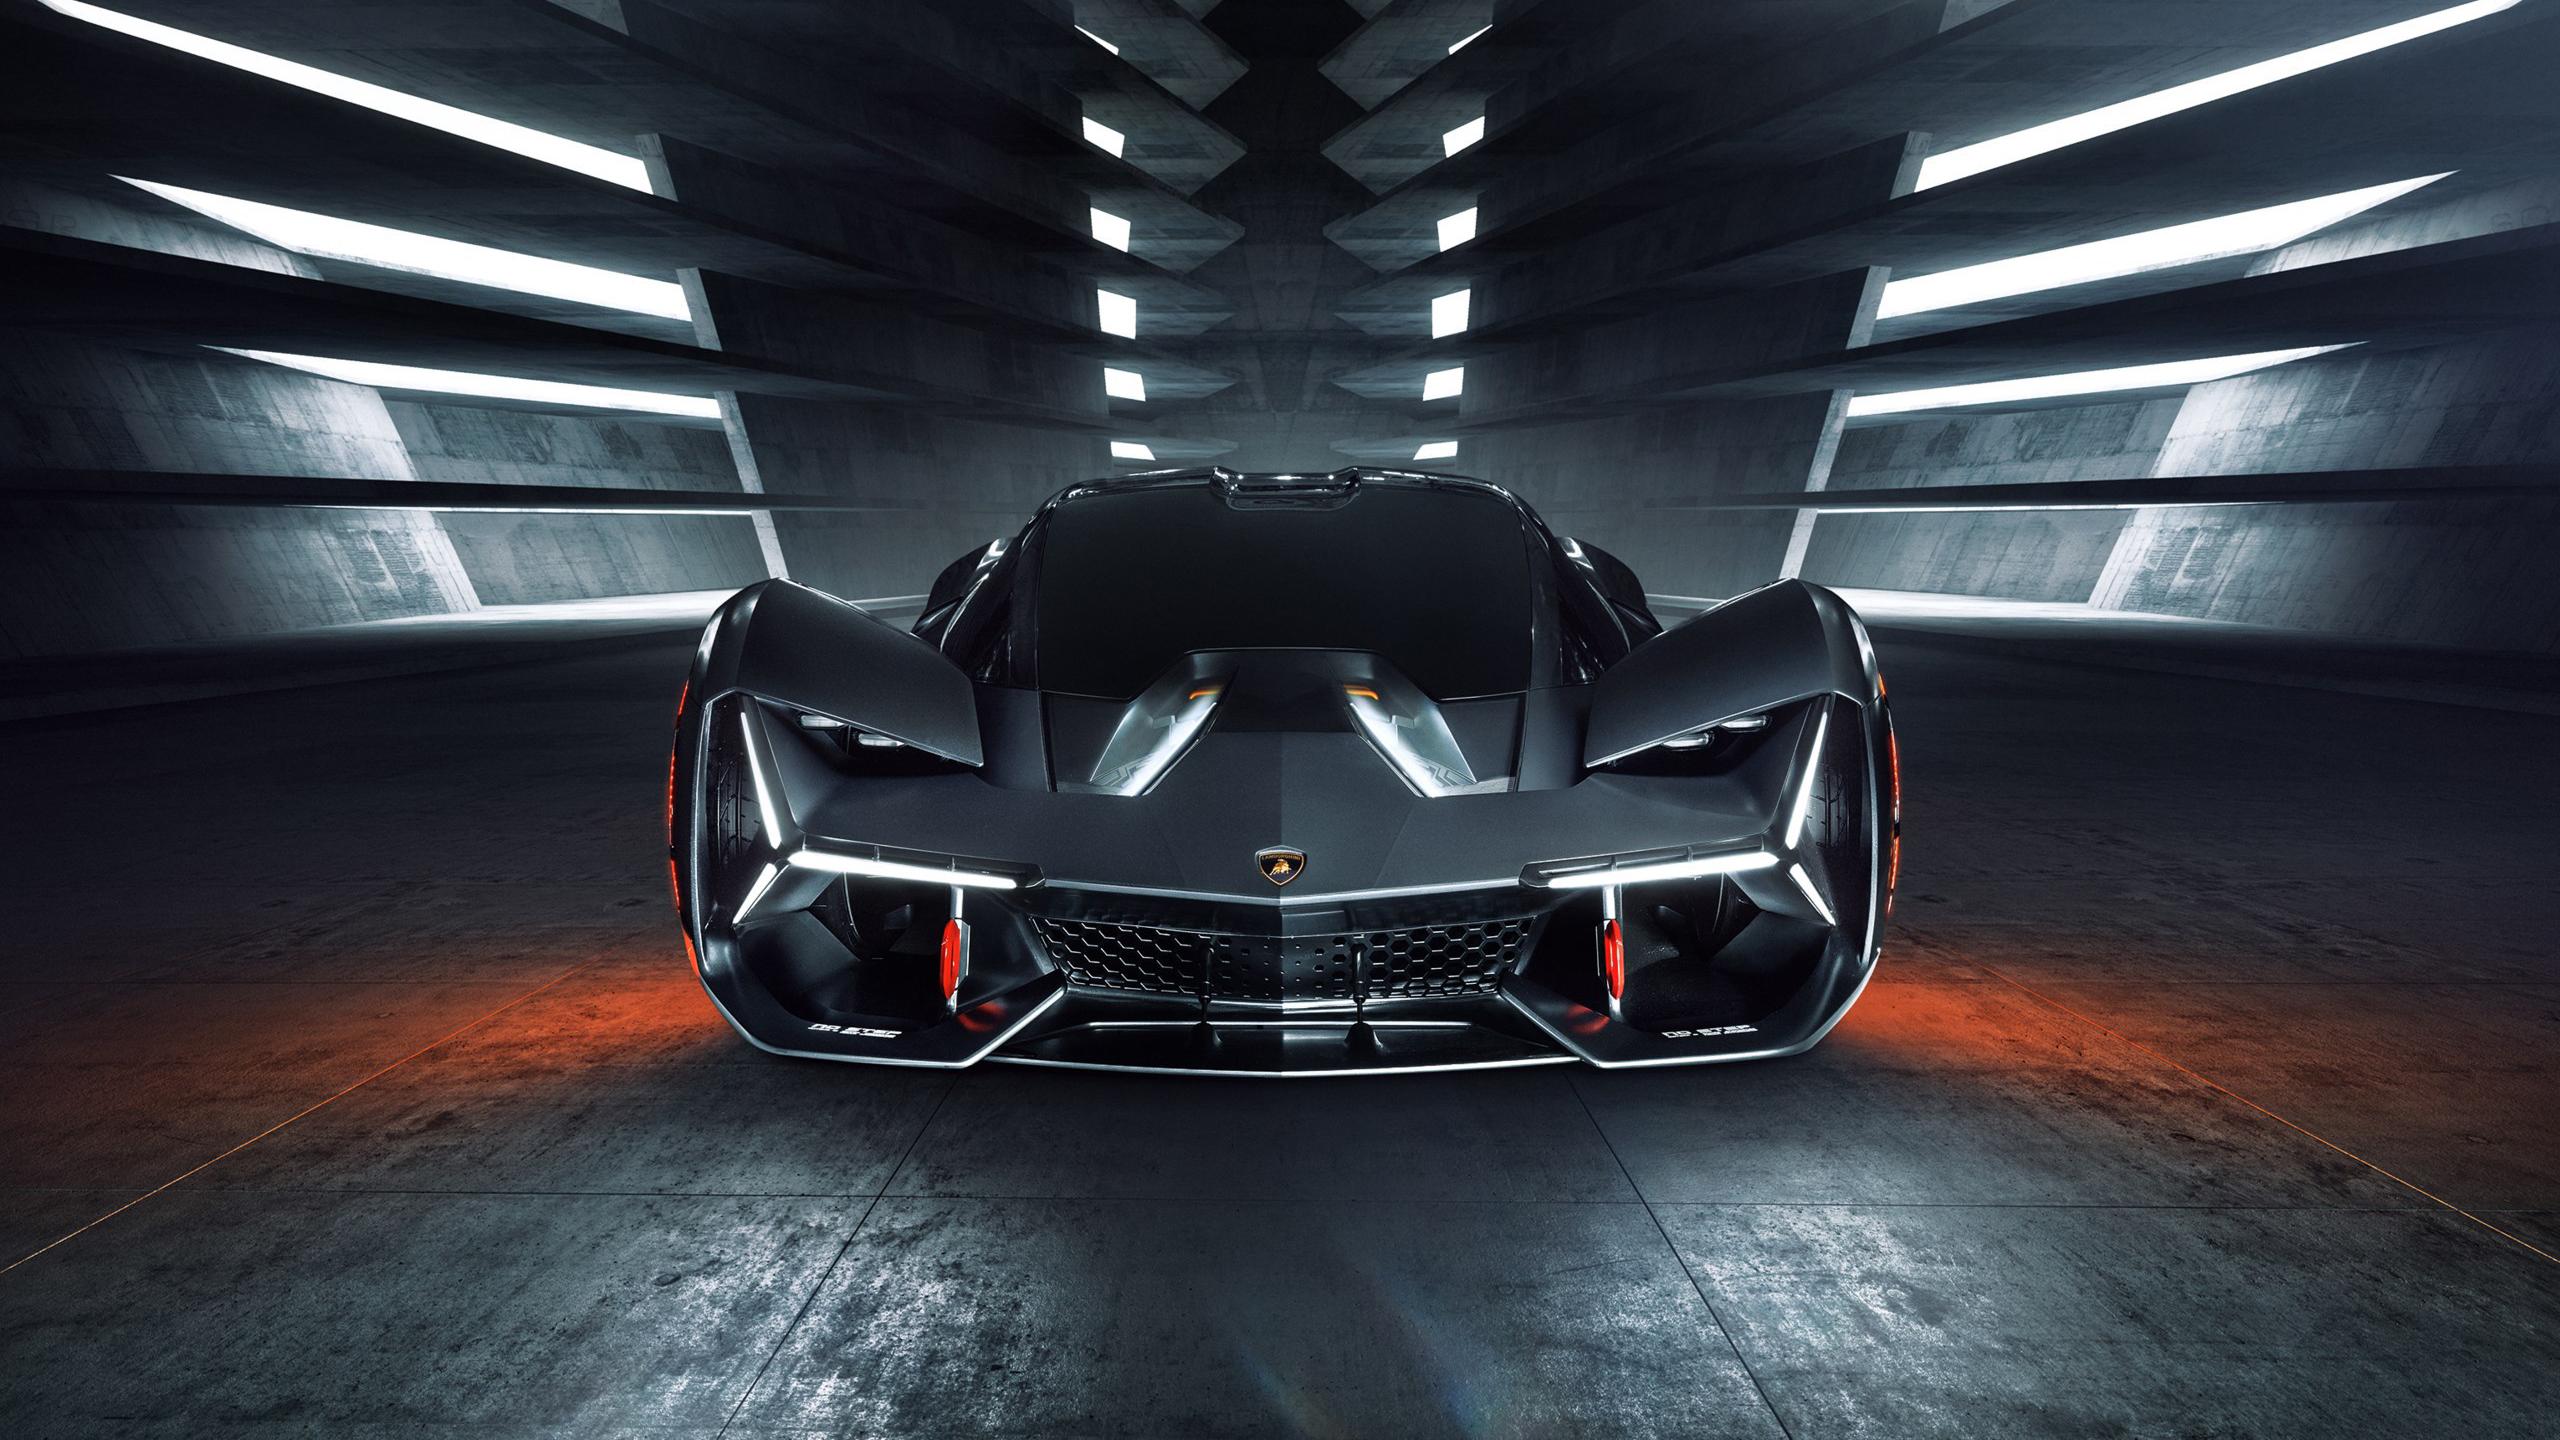 Lamborghini Terzo Millennio 2019 Wallpaper Hd Car Wallpapers Id 11701